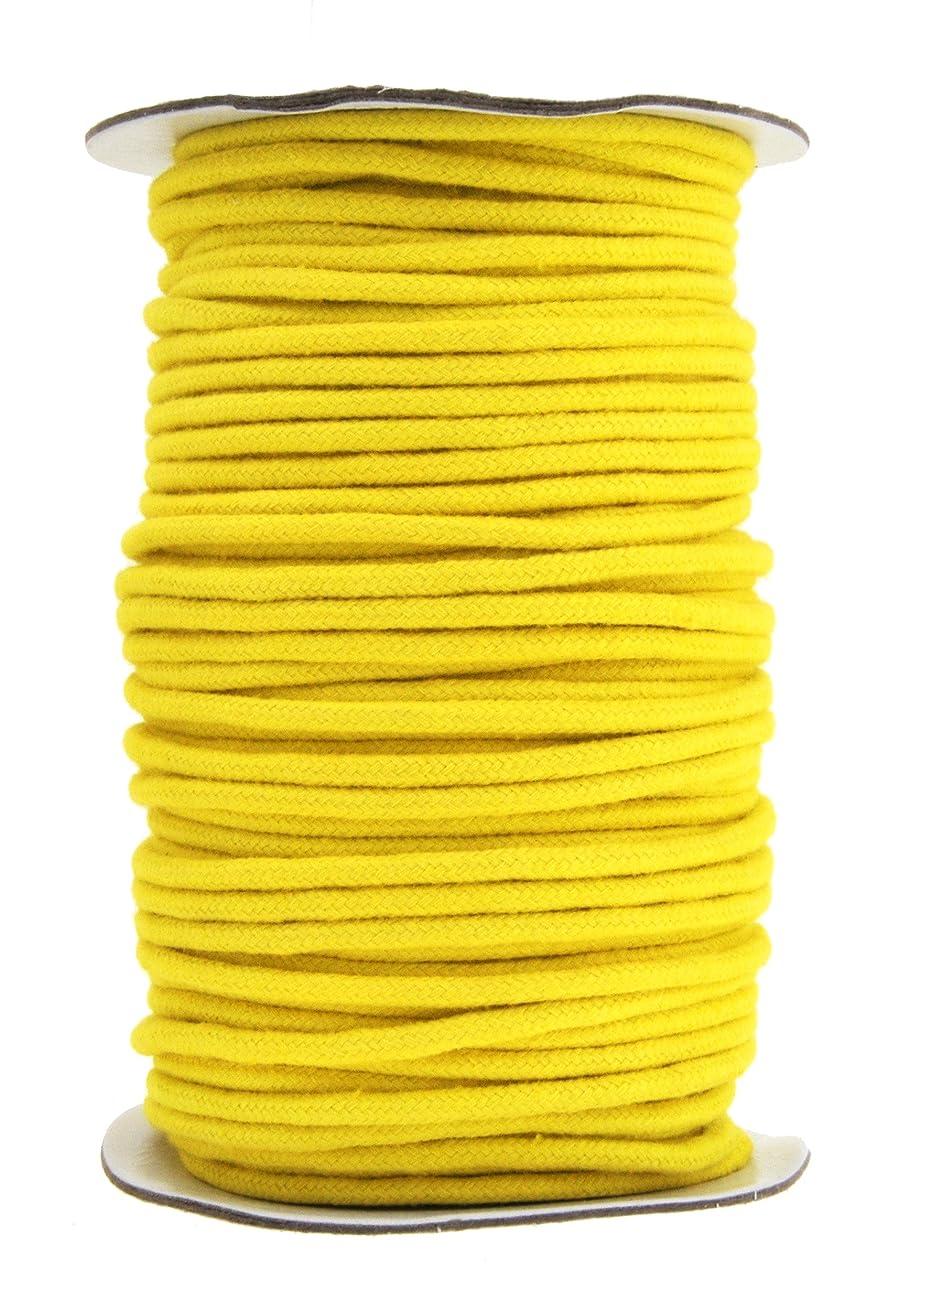 Mandala Crafts Soft Drawstring Replacement Rope Upholstery Crochet Macramé Cotton Welt Trim Piping Cord (Yellow, 3mm)